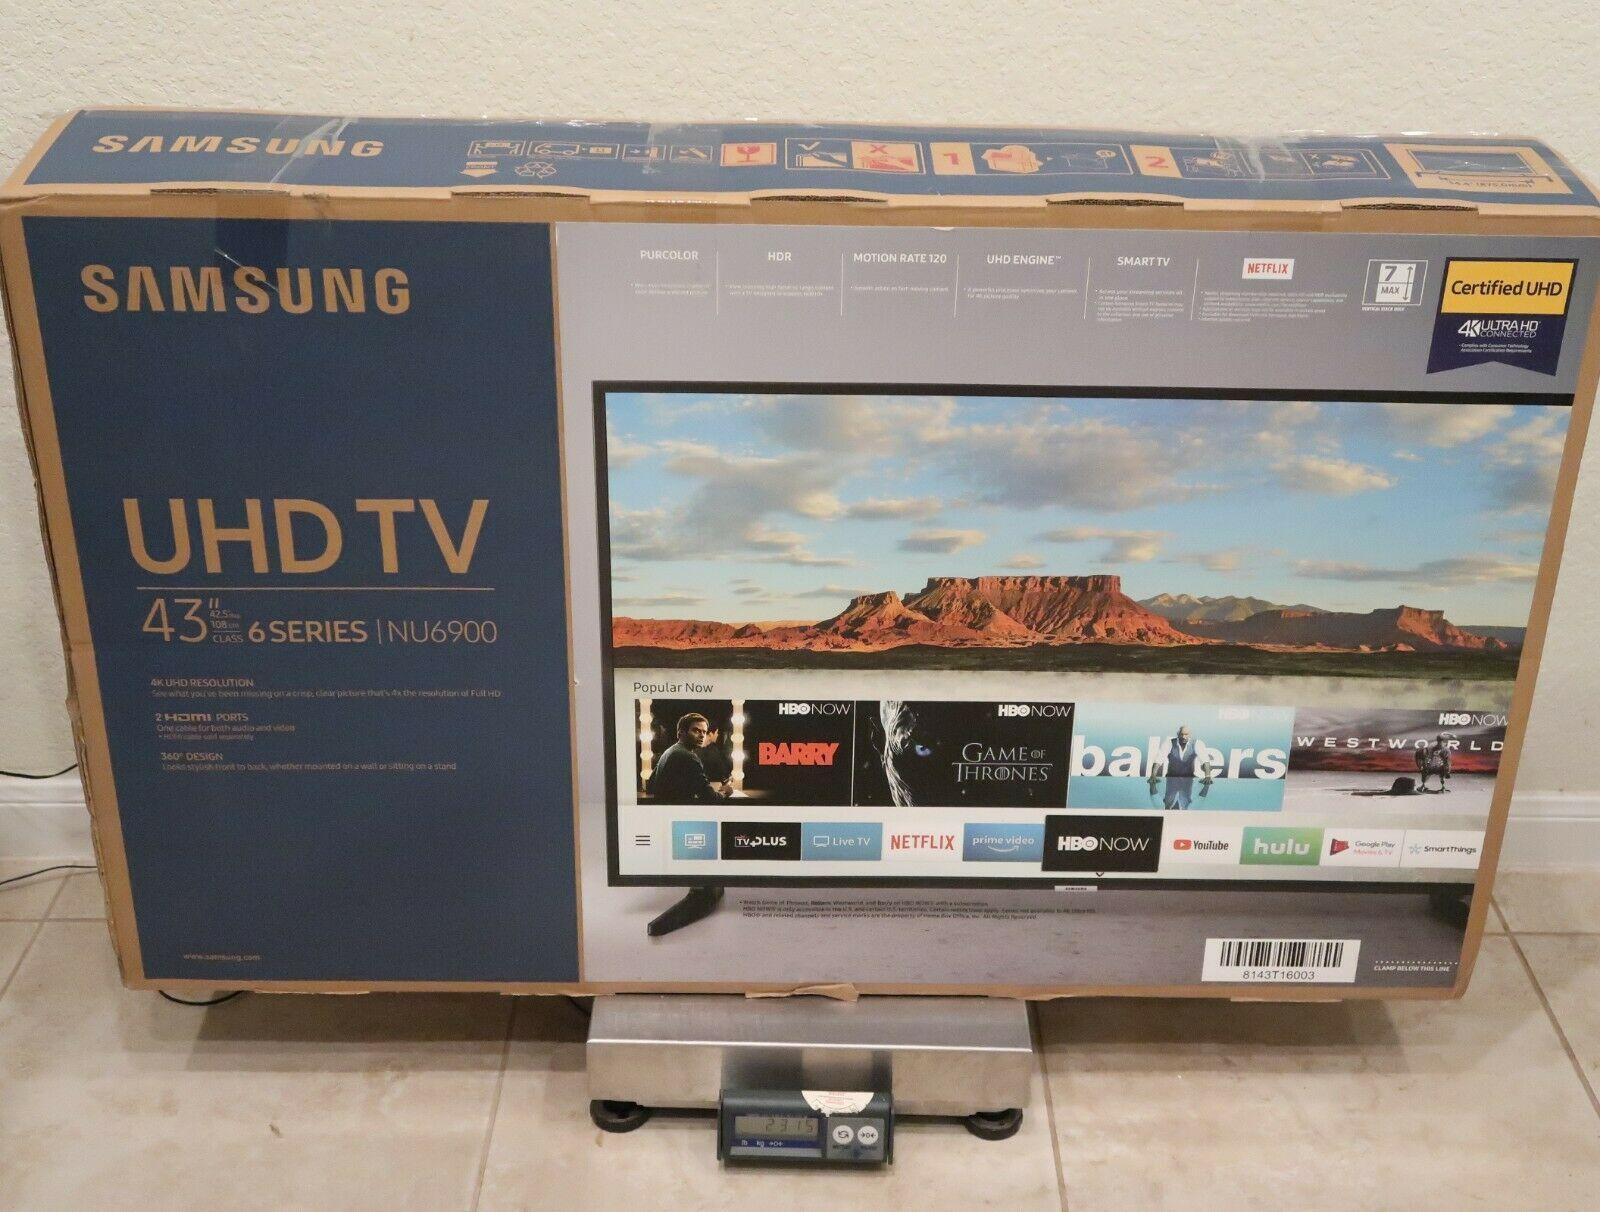 Samsung 43 Class 4k 2160p Ultra Hd Smart Led Hdr Tv Un43nu6900 Smart Tv Ideas Of Smart Tv Smarttv Led Tv Smart Tv Smart Samsung 43 smart 1080p led lcd tv